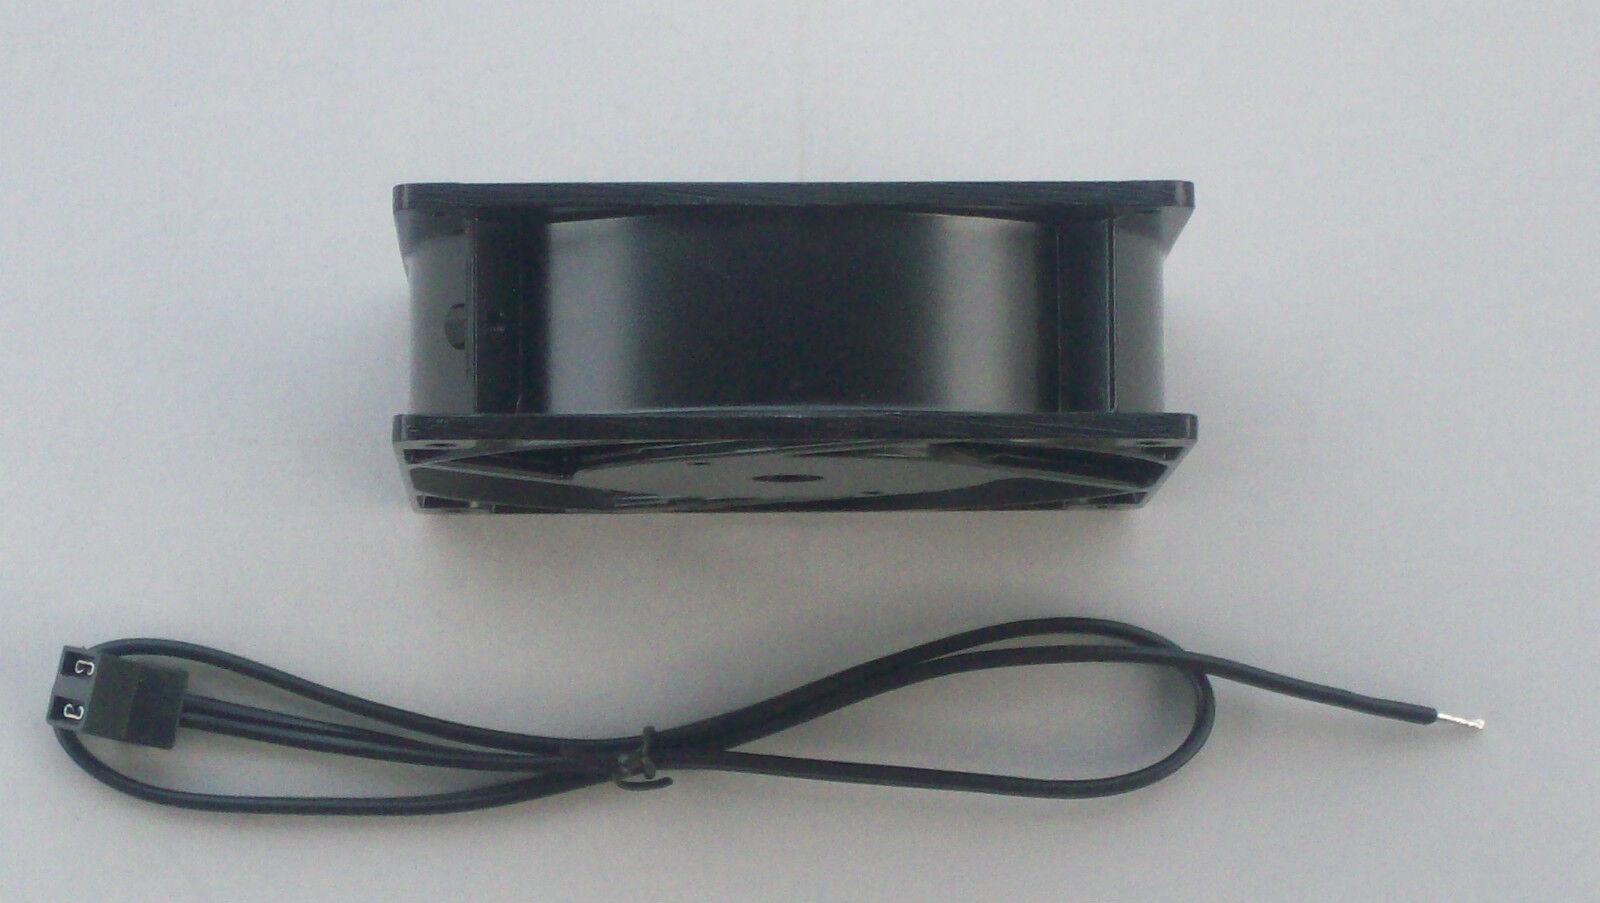 Blower Fan Motor Replaces Quadra Fire 832 3190 For Wood